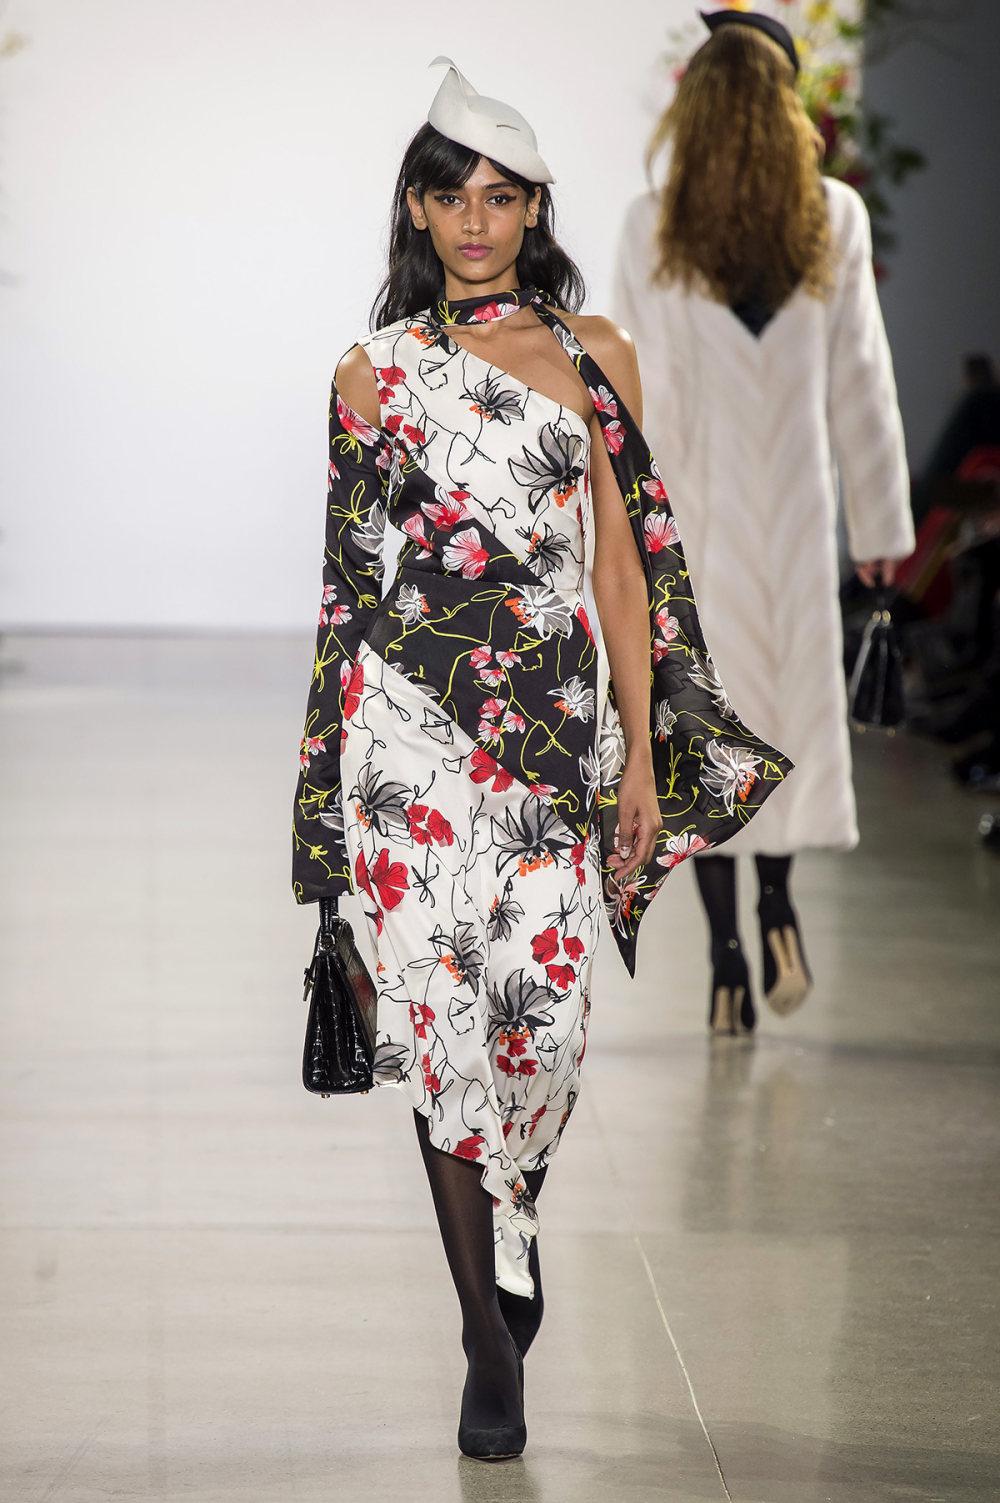 Bibhu Mohapatra时装系列颜色点缀蕾丝刺绣和结构的压轴礼服-17.jpg